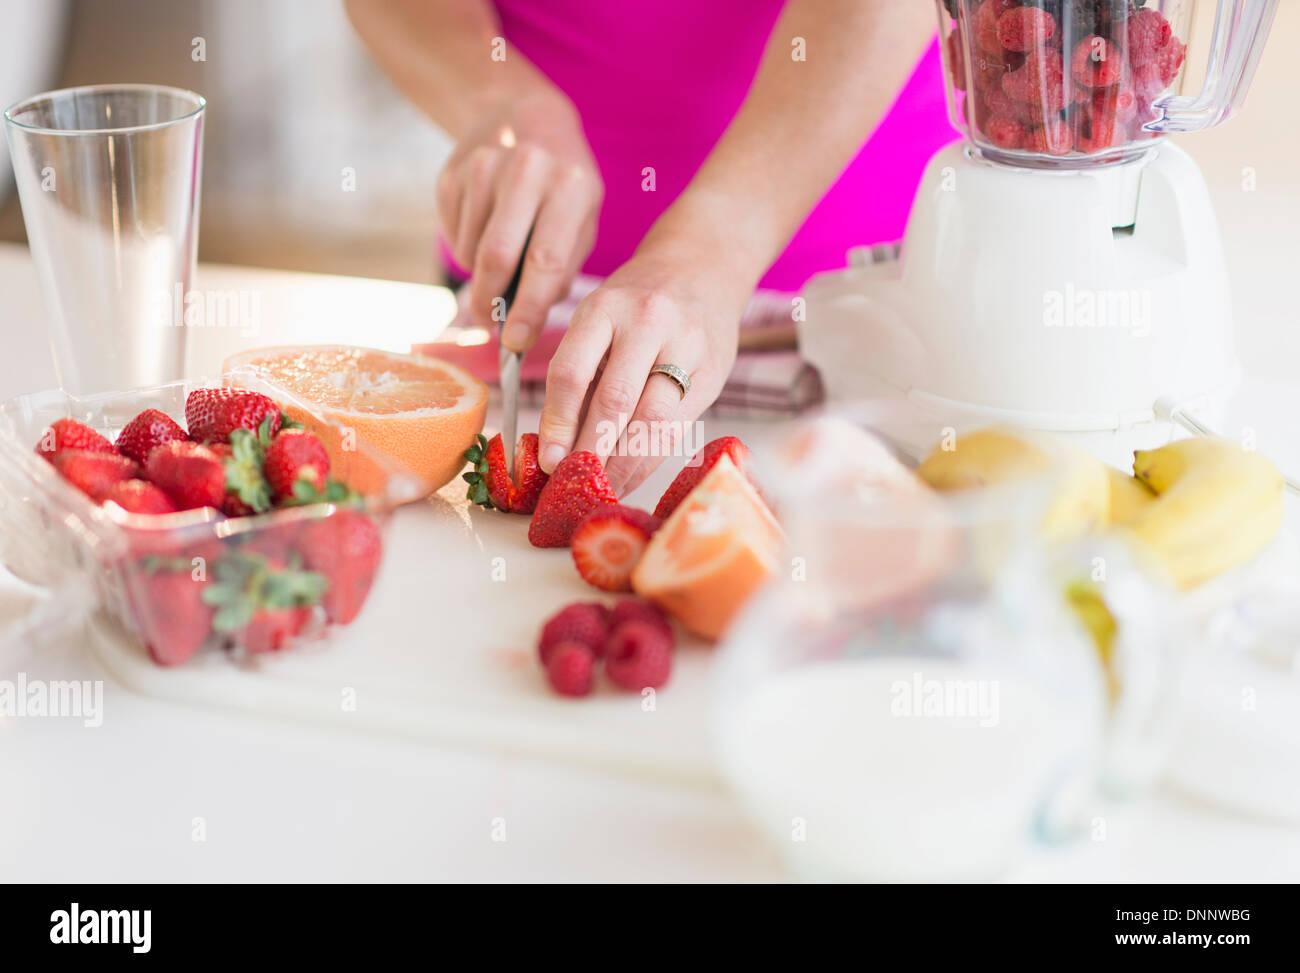 Woman slicing strawberries - Stock Image